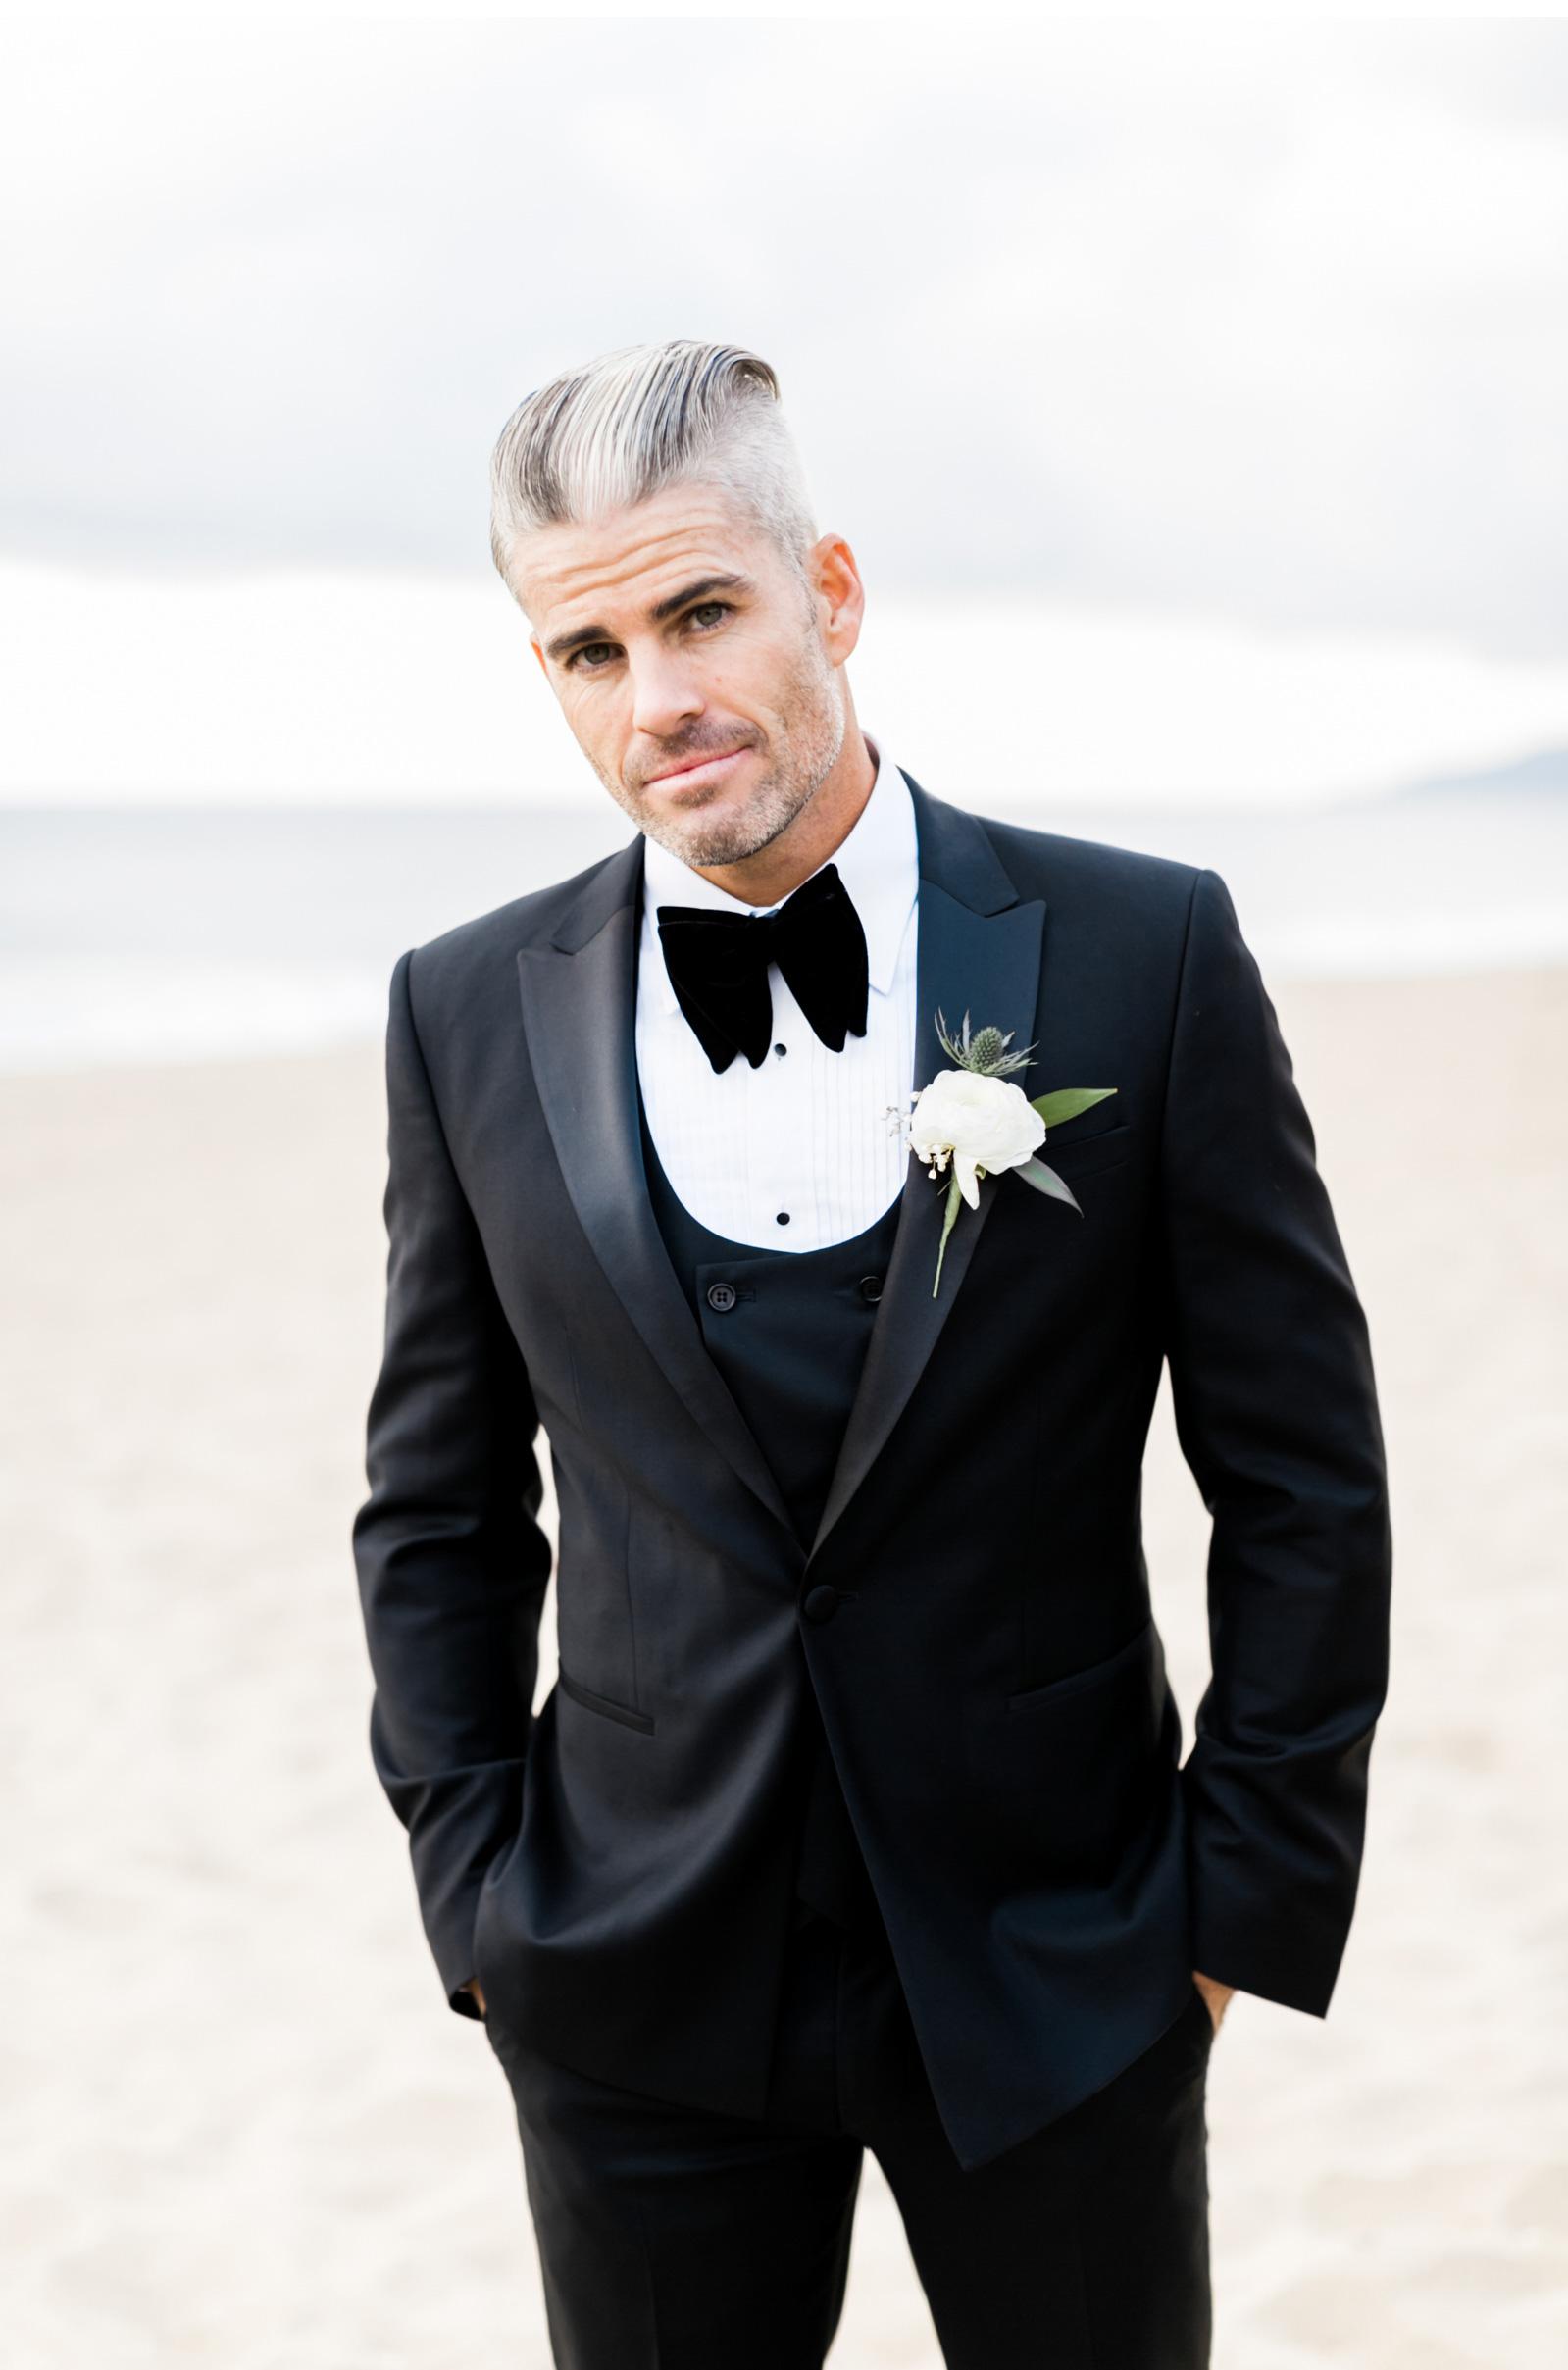 Rod-and-Lorin-Brewster-Style-Me-Pretty-Malibu-Beach-Wedding-Natalie-Schutt-Photography_15.jpg